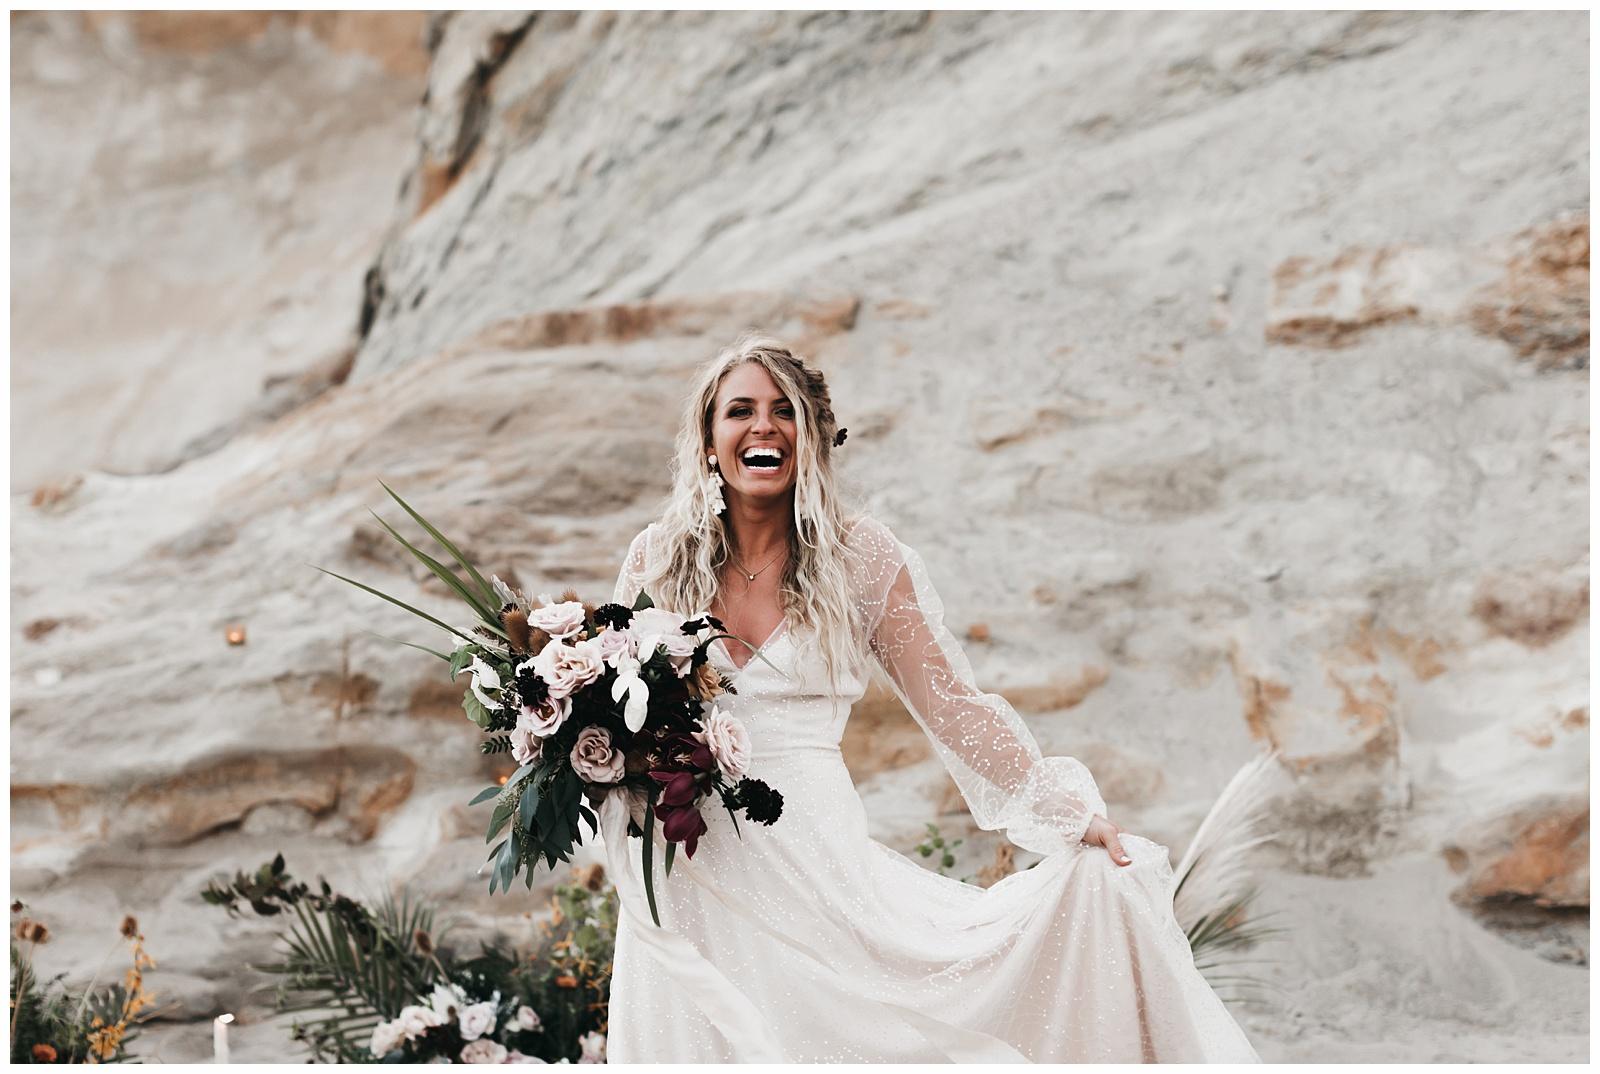 portland-wedding-photographer-pacific-city-elopement-photographer-anniezav_0032.jpg